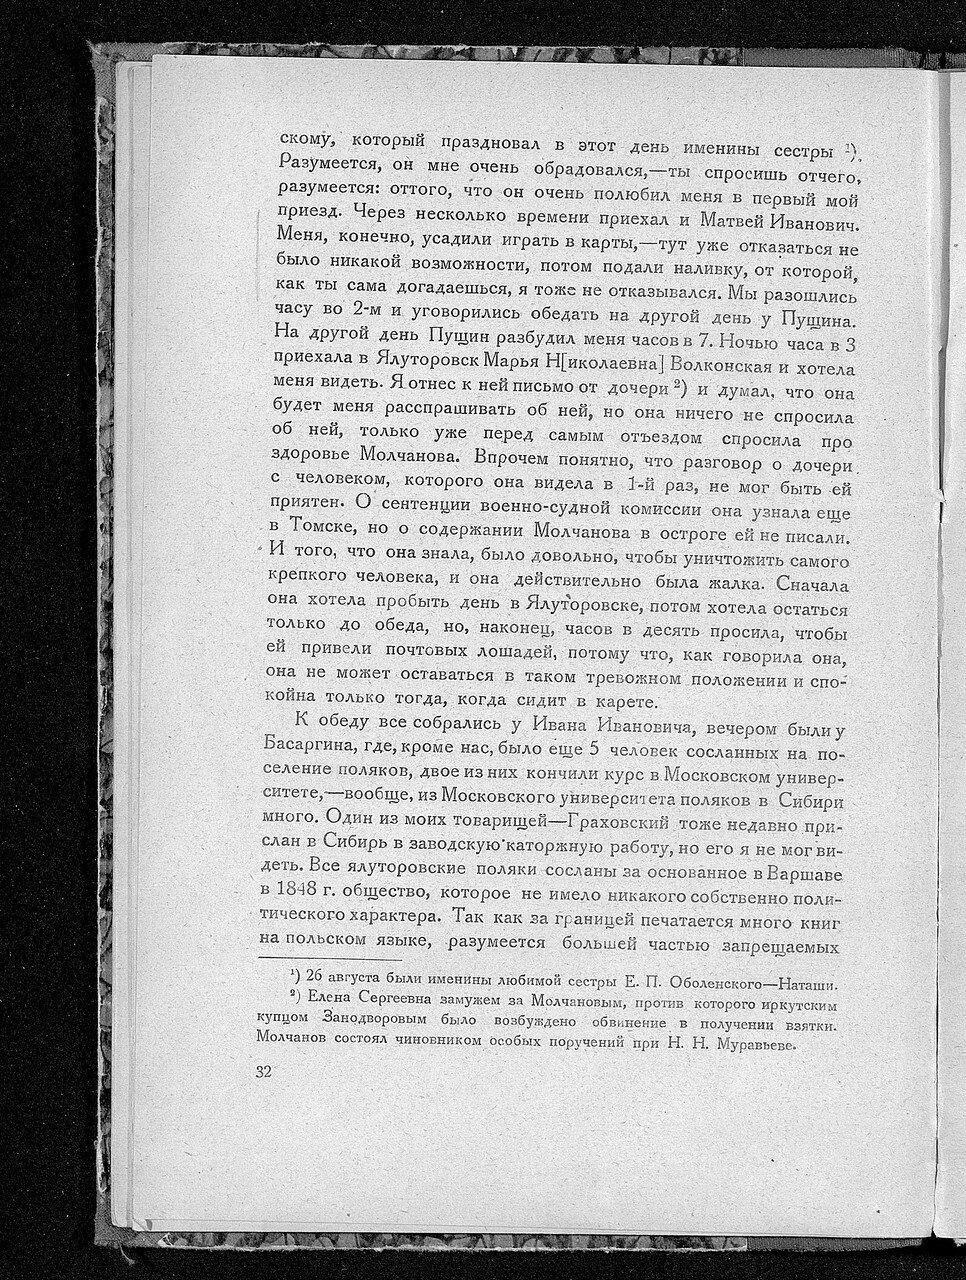 https://img-fotki.yandex.ru/get/894414/199368979.a0/0_21431d_b71eeff5_XXXL.jpg